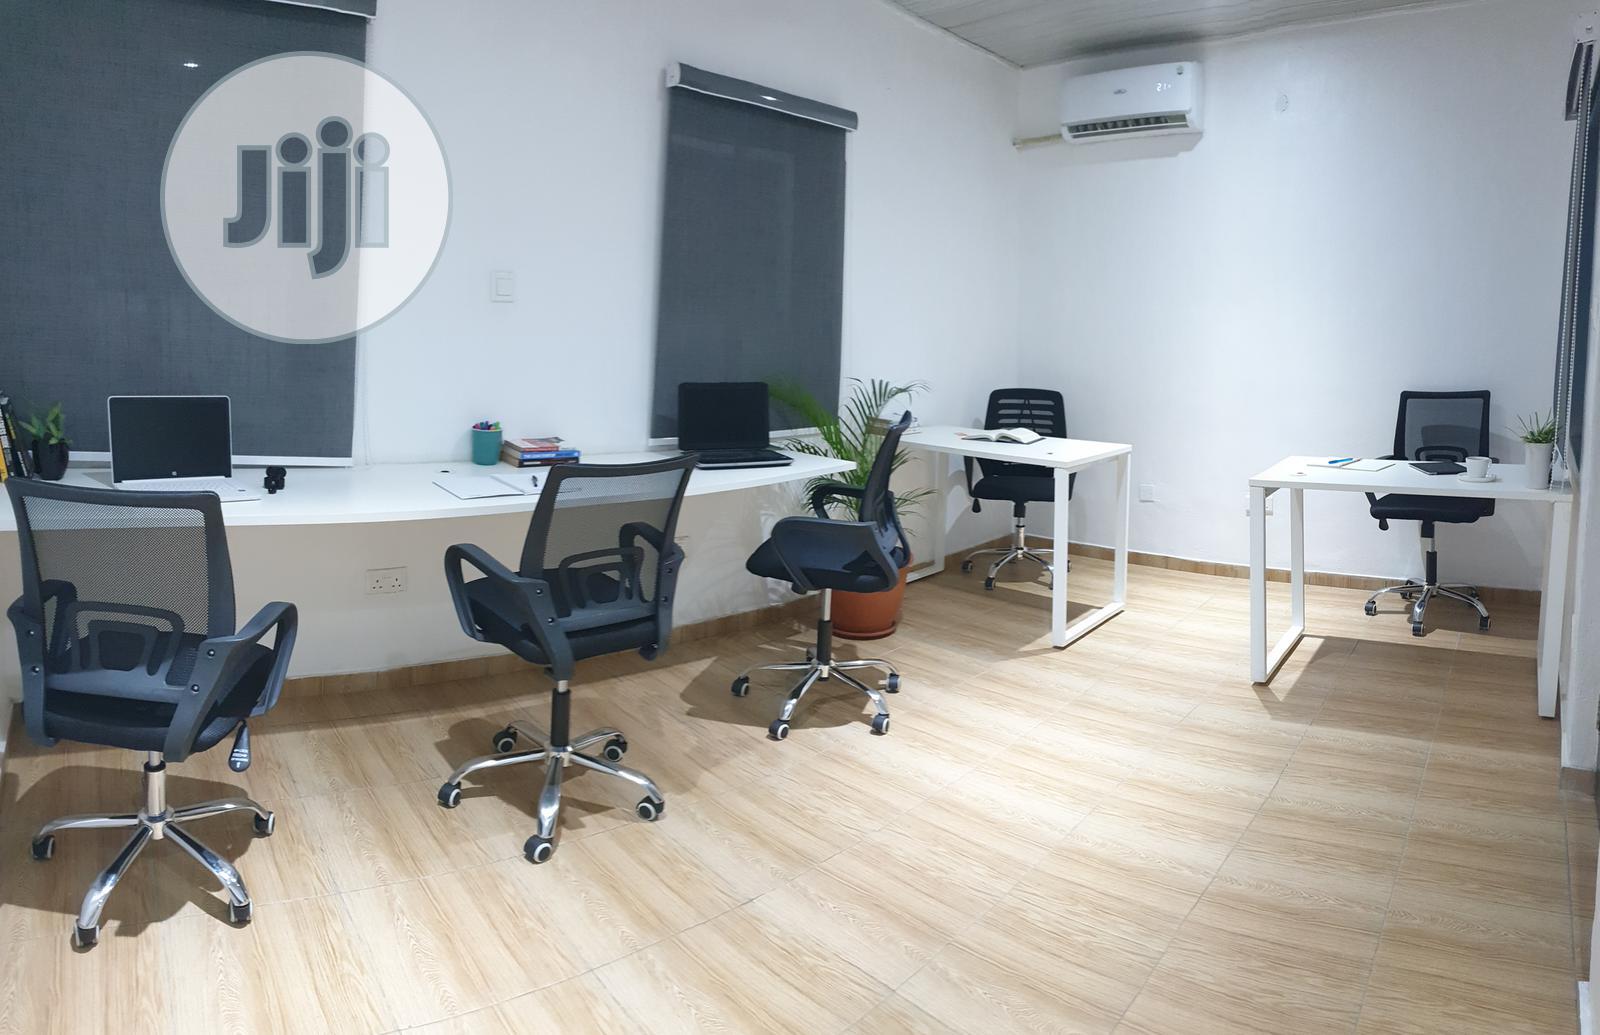 Private Office (7-10 Man Team)